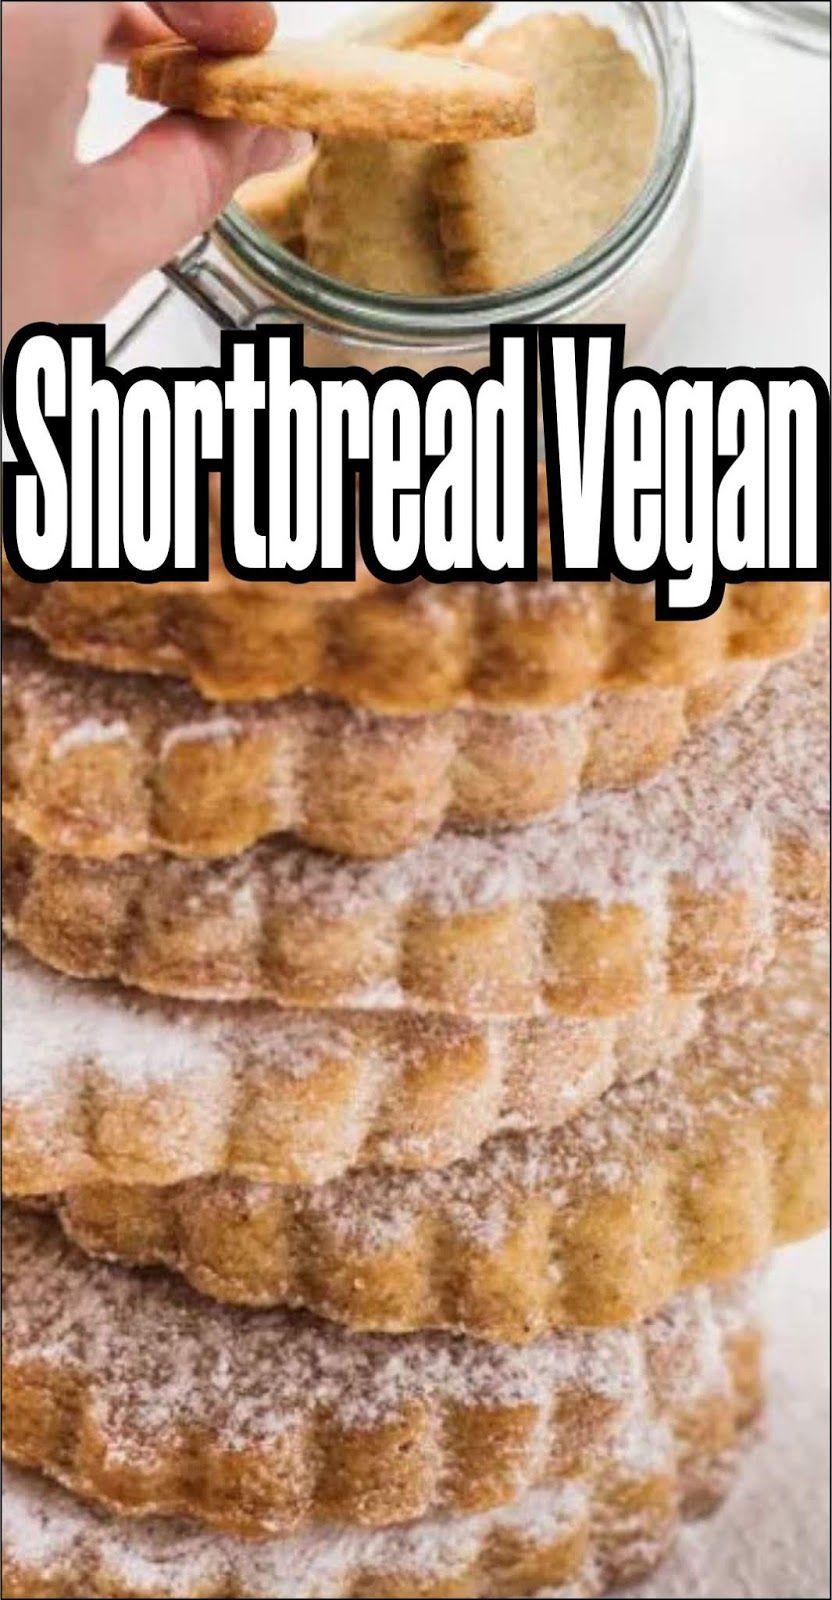 Delicious Shortbreads Vegan.